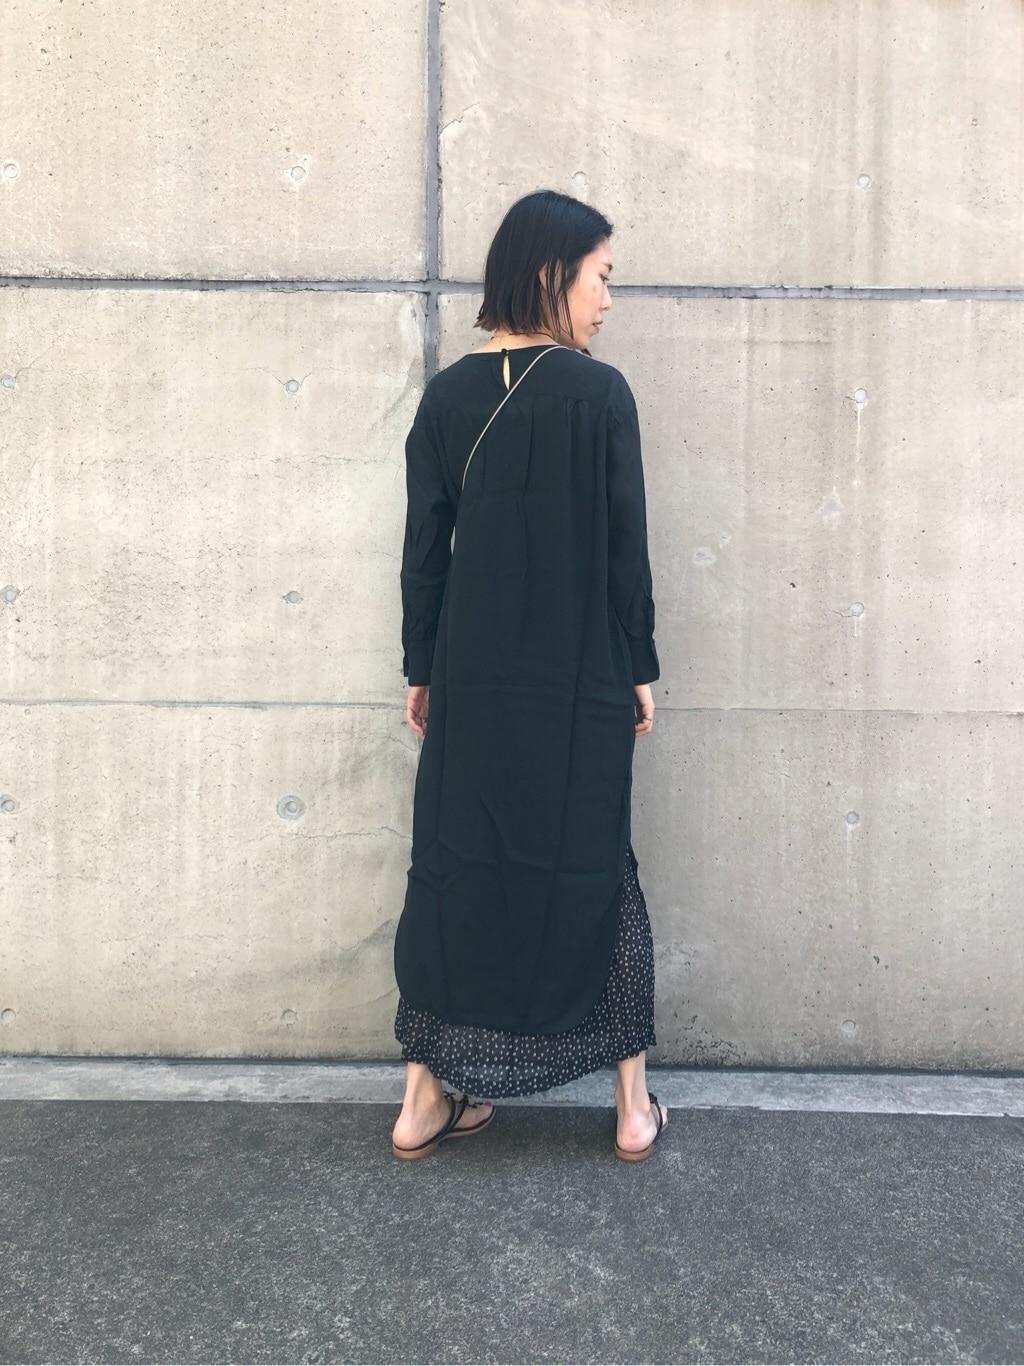 note et silence. ルミネ新宿 身長:169cm 2020.07.03